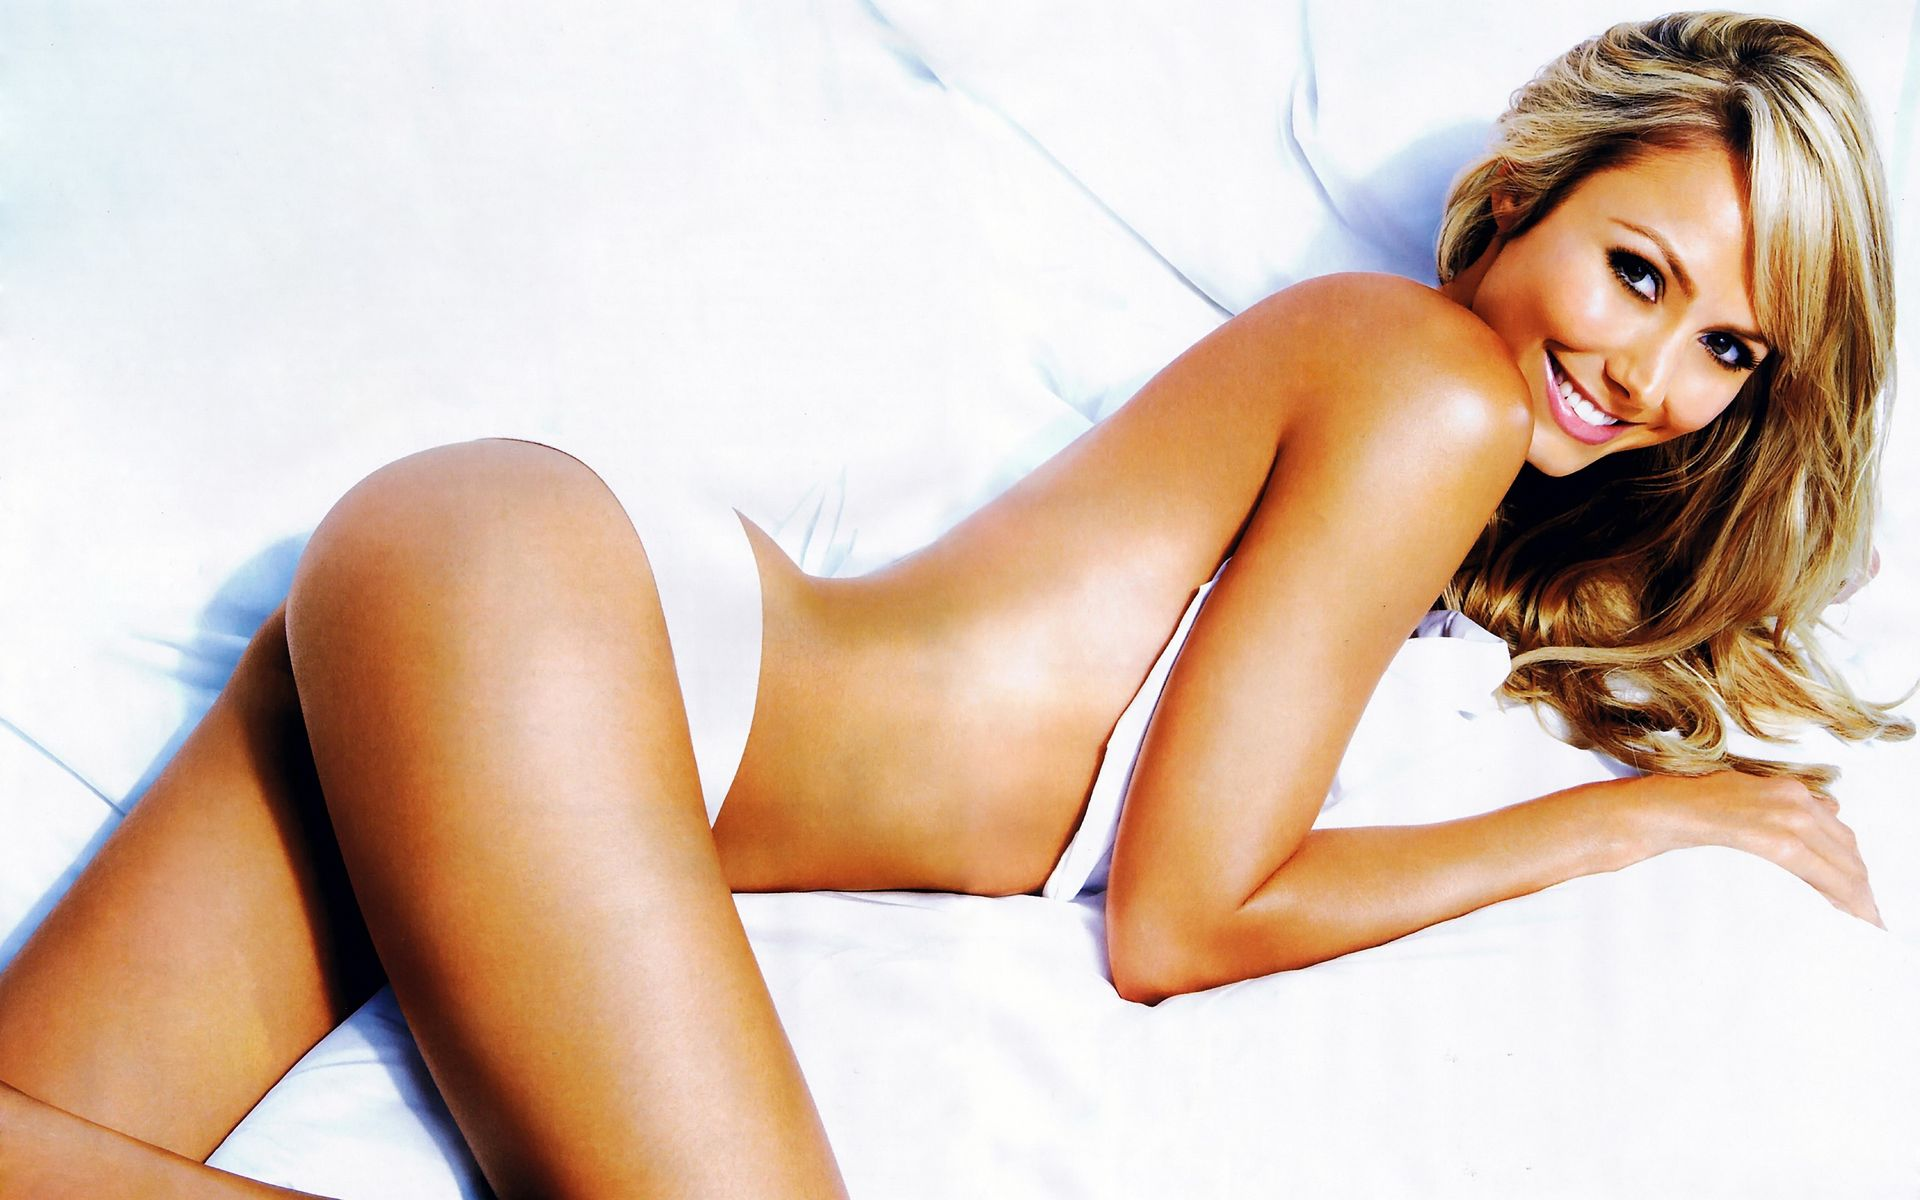 stacy-keibler-nude-sexy-22-thefappeningblog.com_.jpg